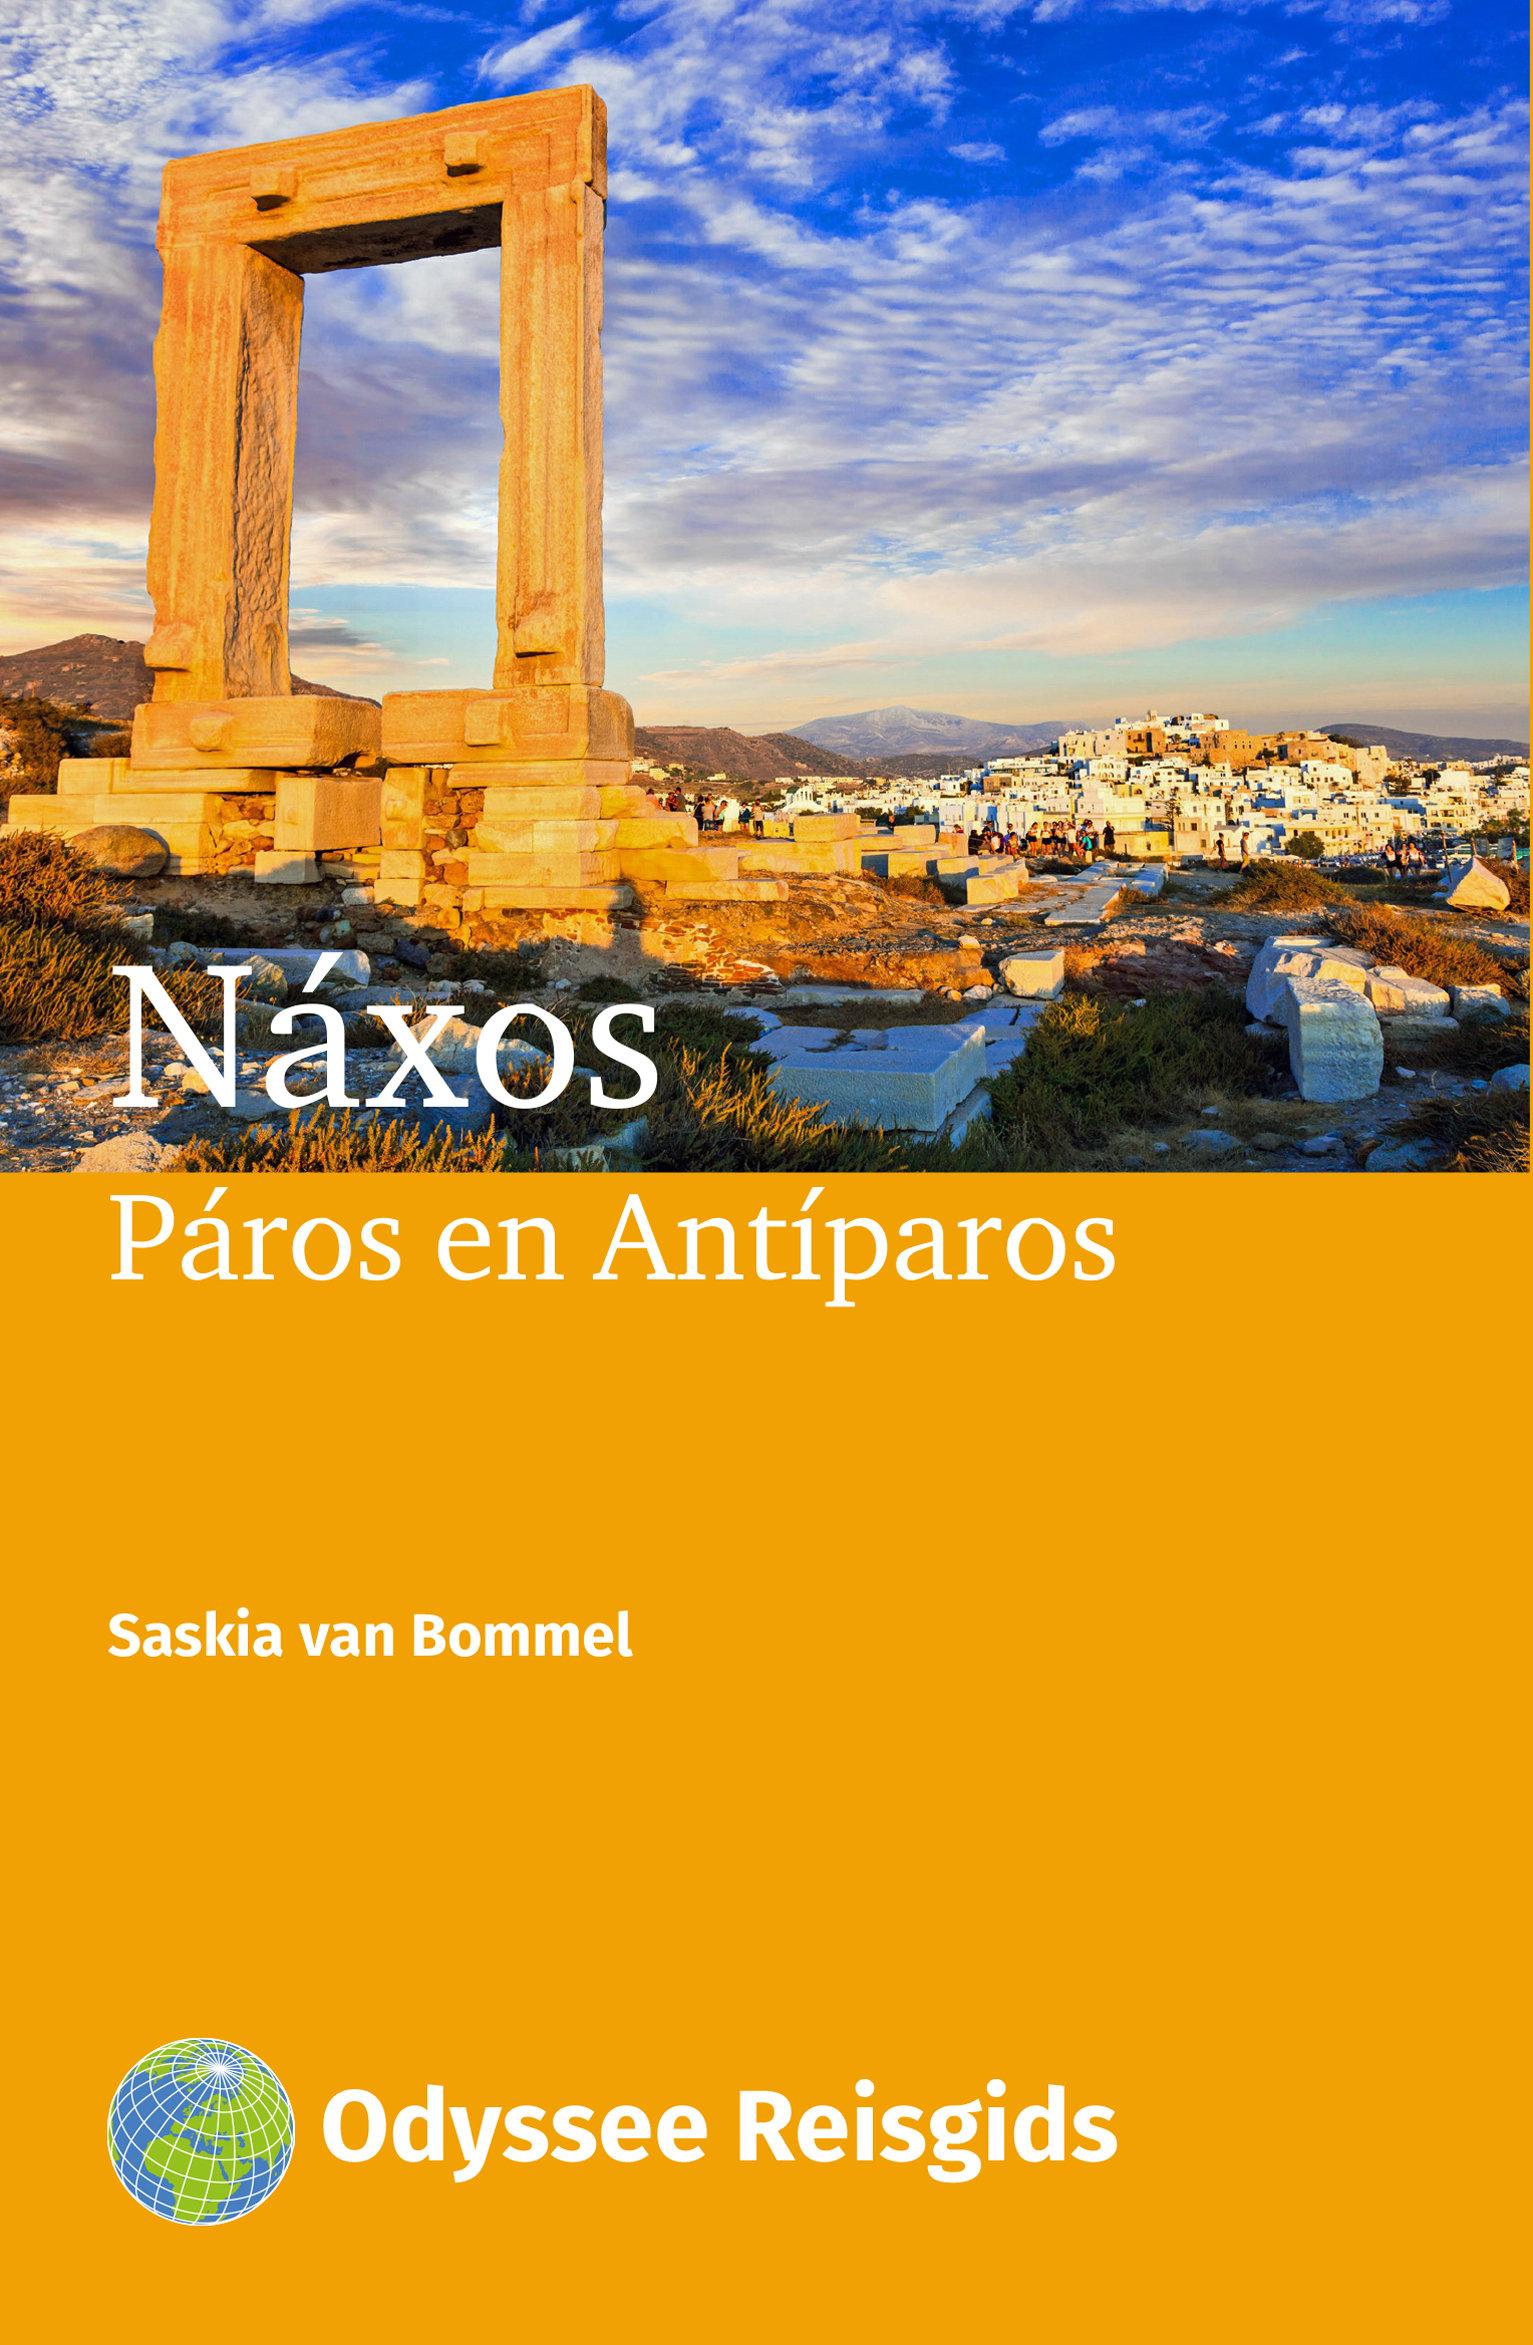 Ontdek Naxos, Páros en Antíparos 9789461230591  Odyssee   Reisgidsen Egeïsche Eilanden